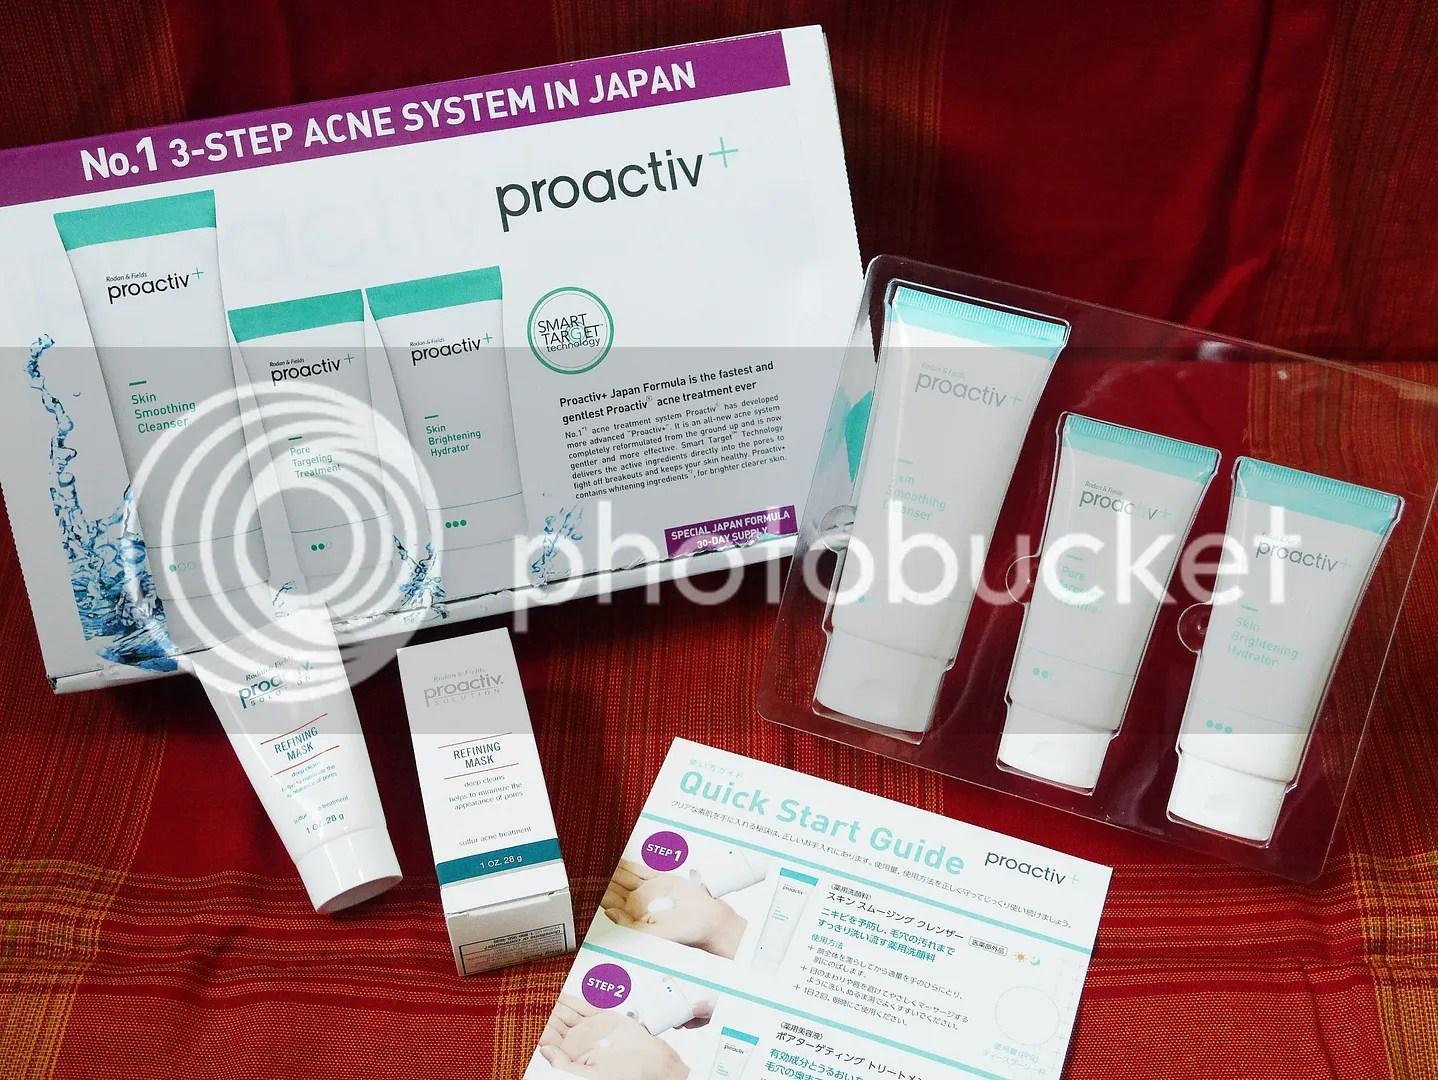 Proactiv Japan Skincare - Blackbox SG [Viktoria Jean]